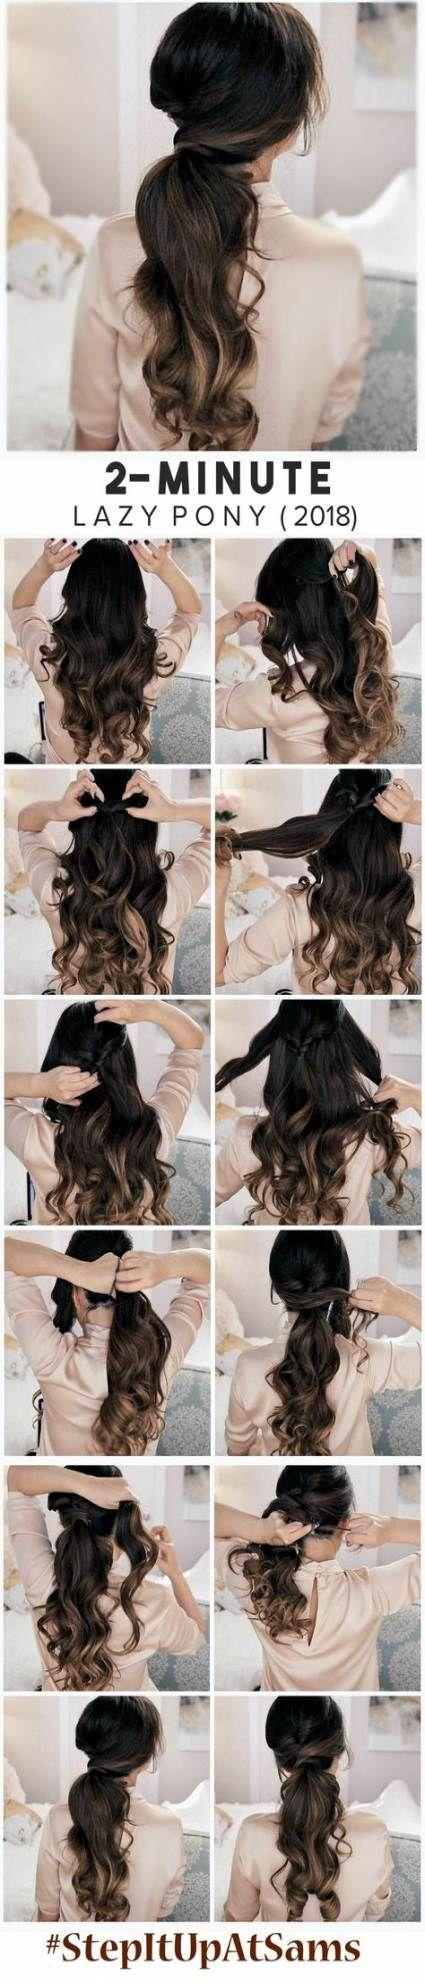 Hairstyles For Medium Length Hair Tutorial Easy It Works 23+ Trendy Ideas ,  #Easy #HAIR #hai...,  #diyhairstylesforblackwomenmedium #Easy #Hai #hair #Hairstyles #ideas #Length #Medium #Trendy #Tutorial #works